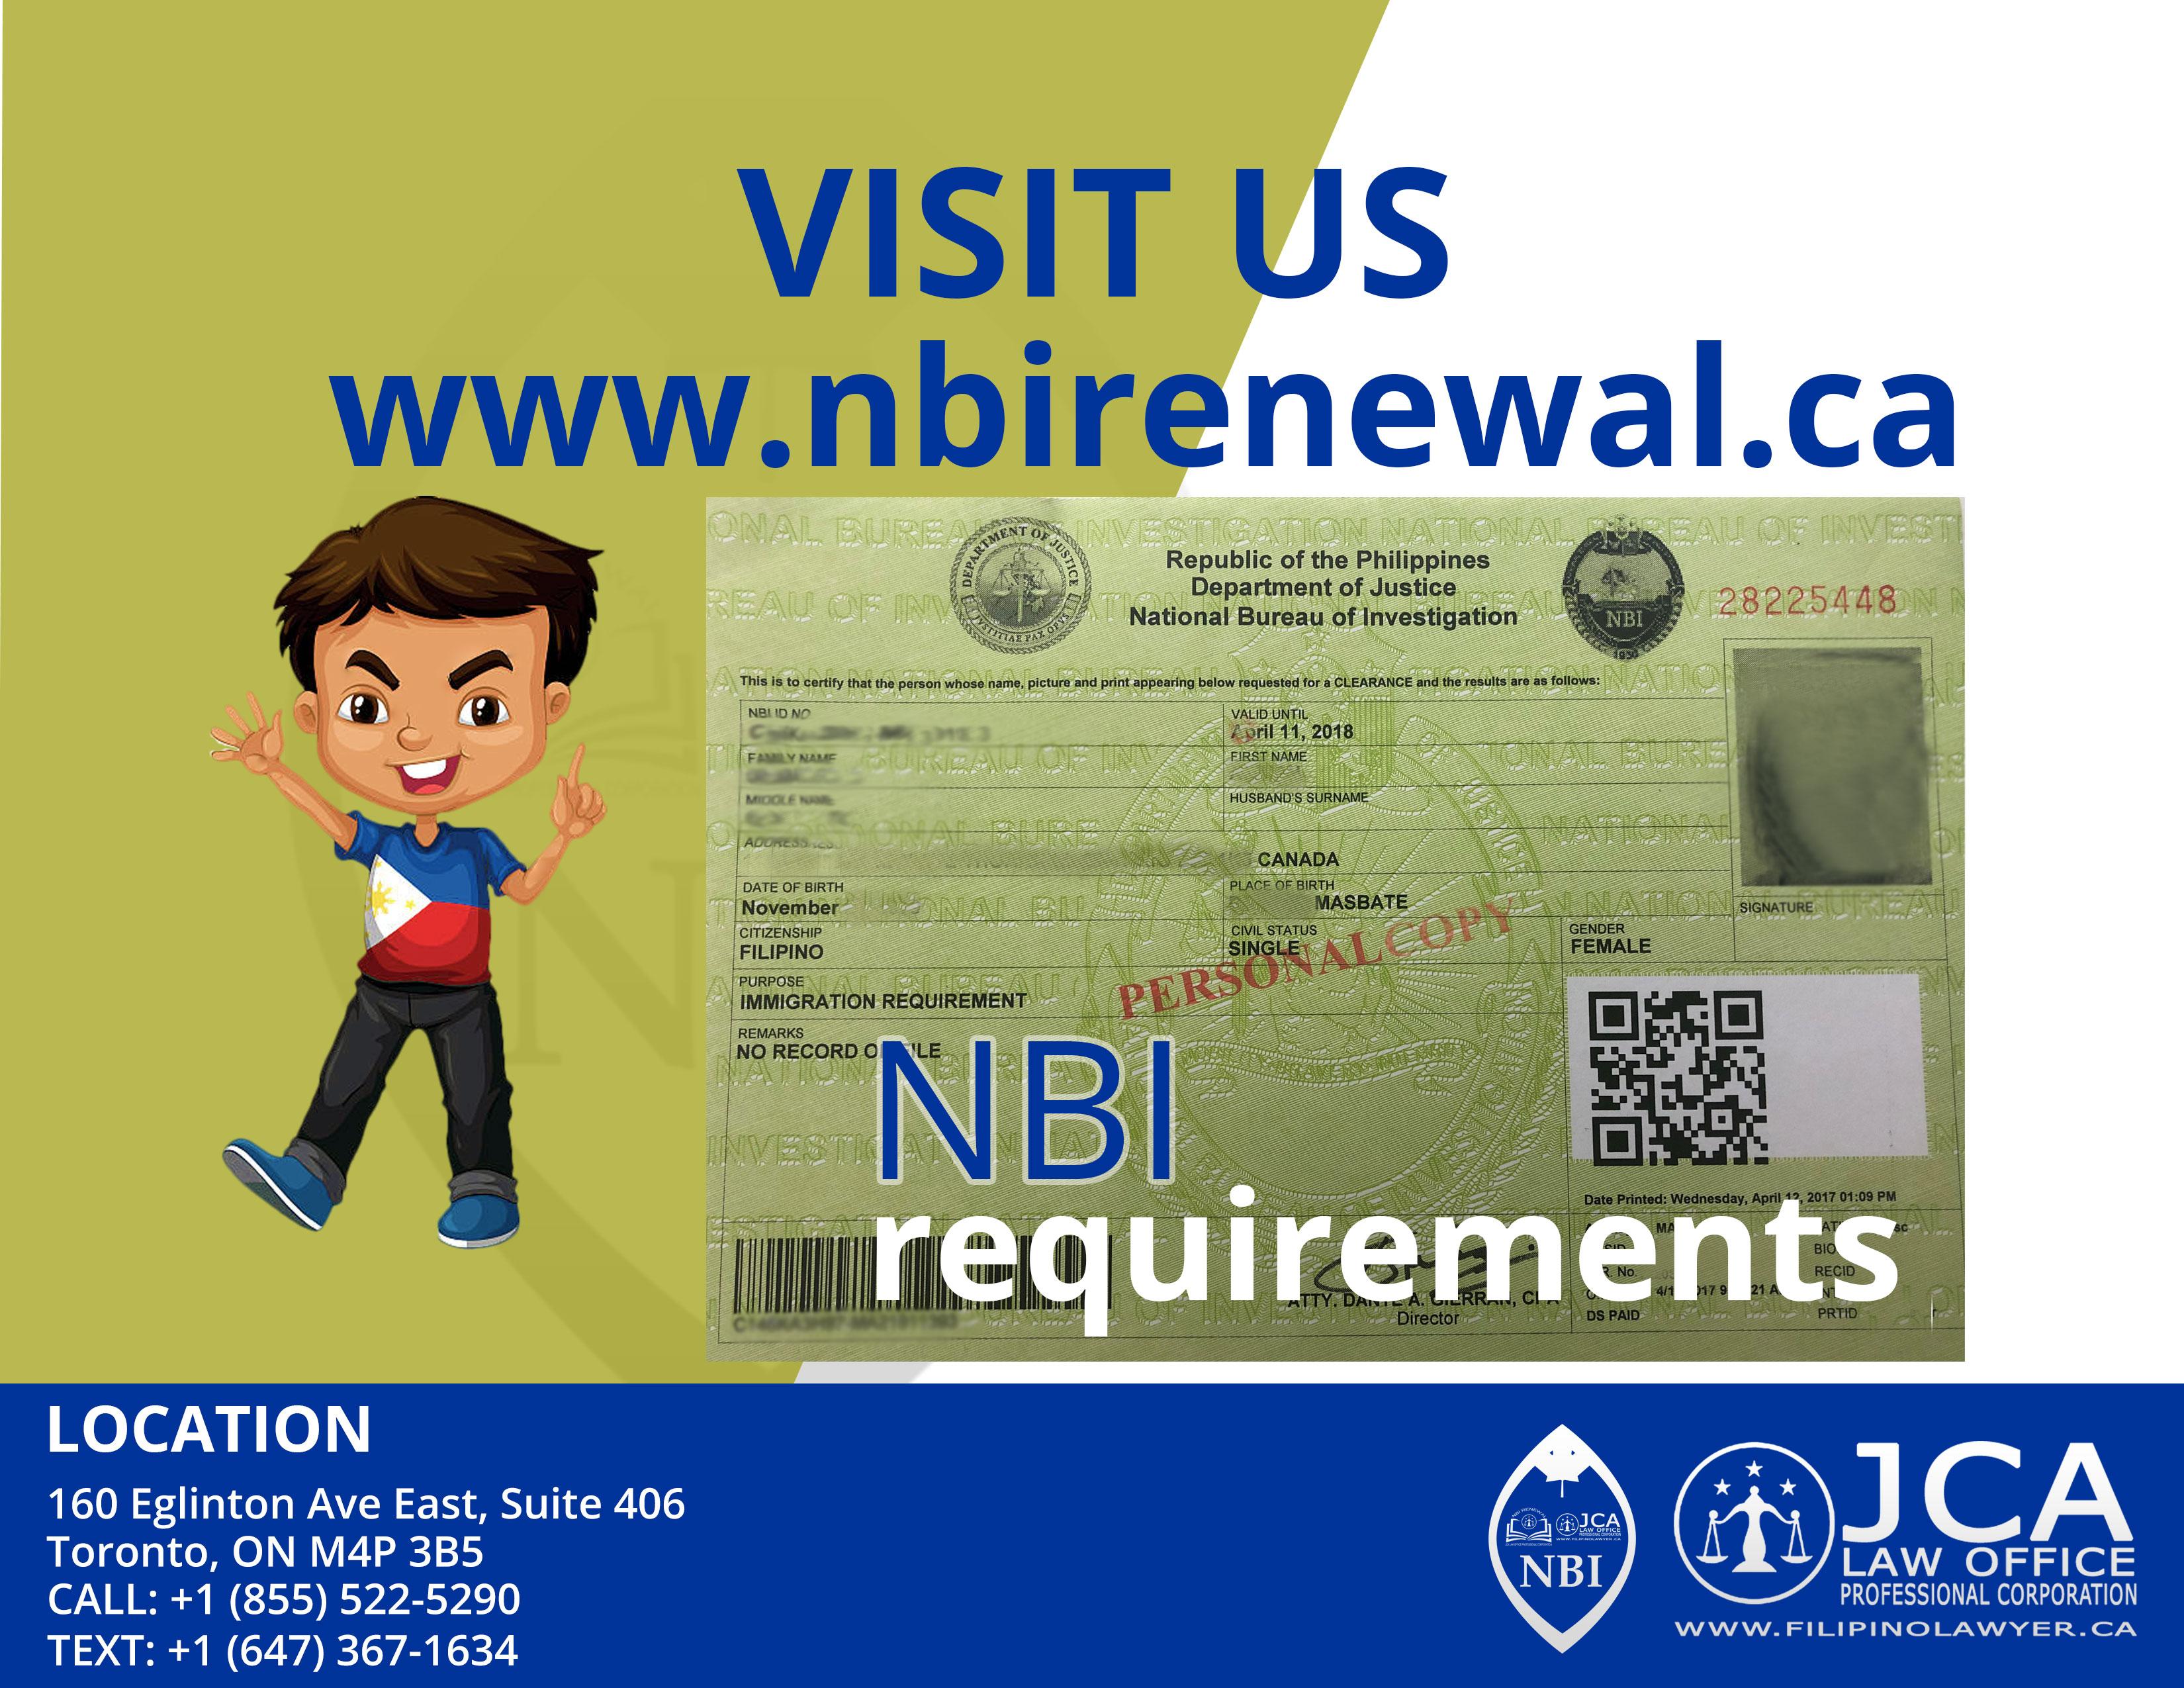 When do I need to get an NBI Clearance in Canada? - NBI